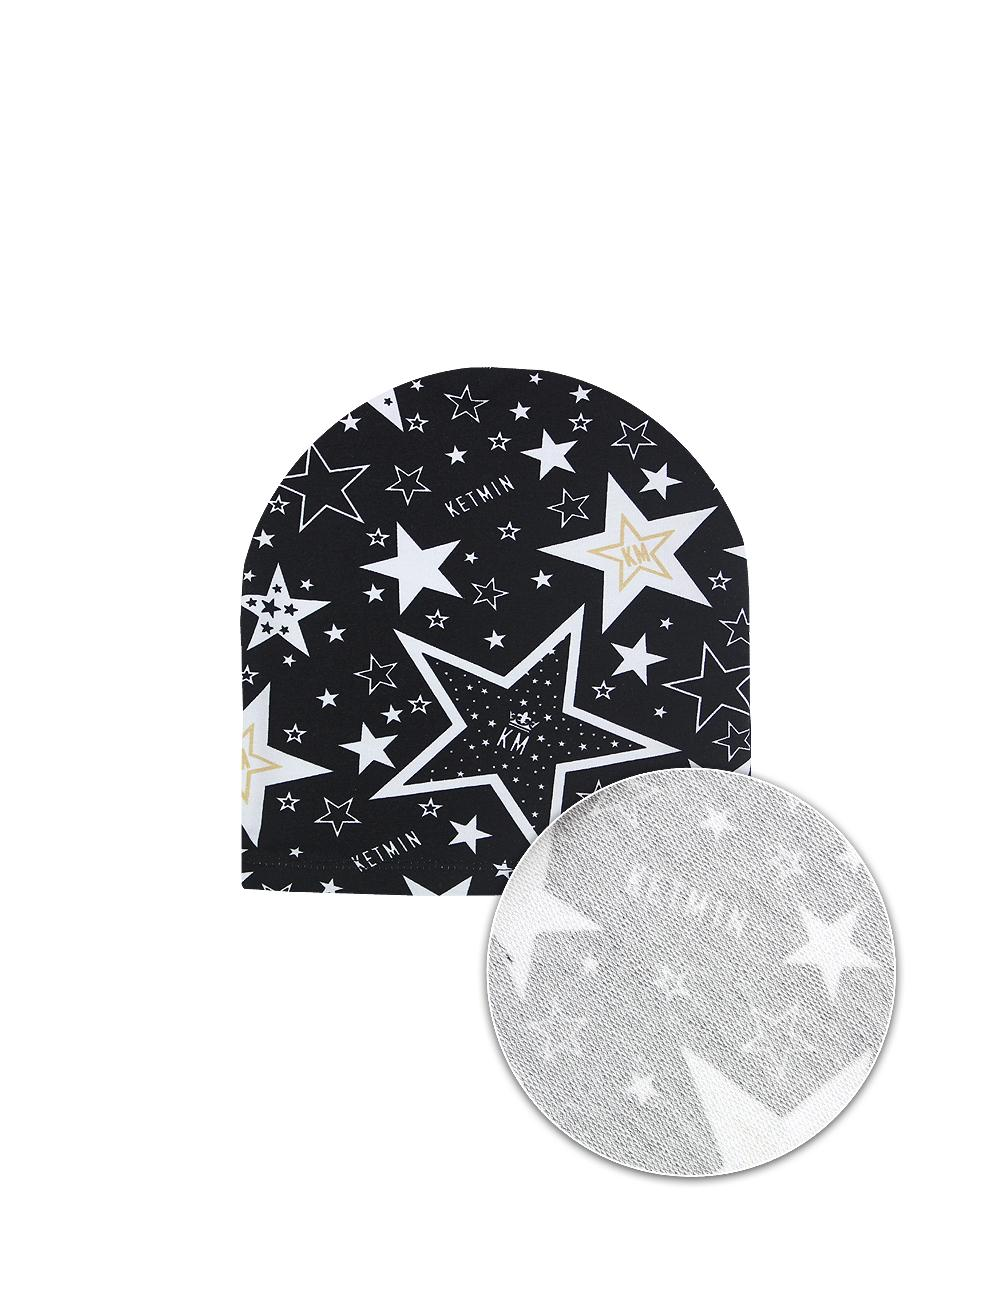 Шапка KETMIN STAR KM тк.Футер цв.Чёрный